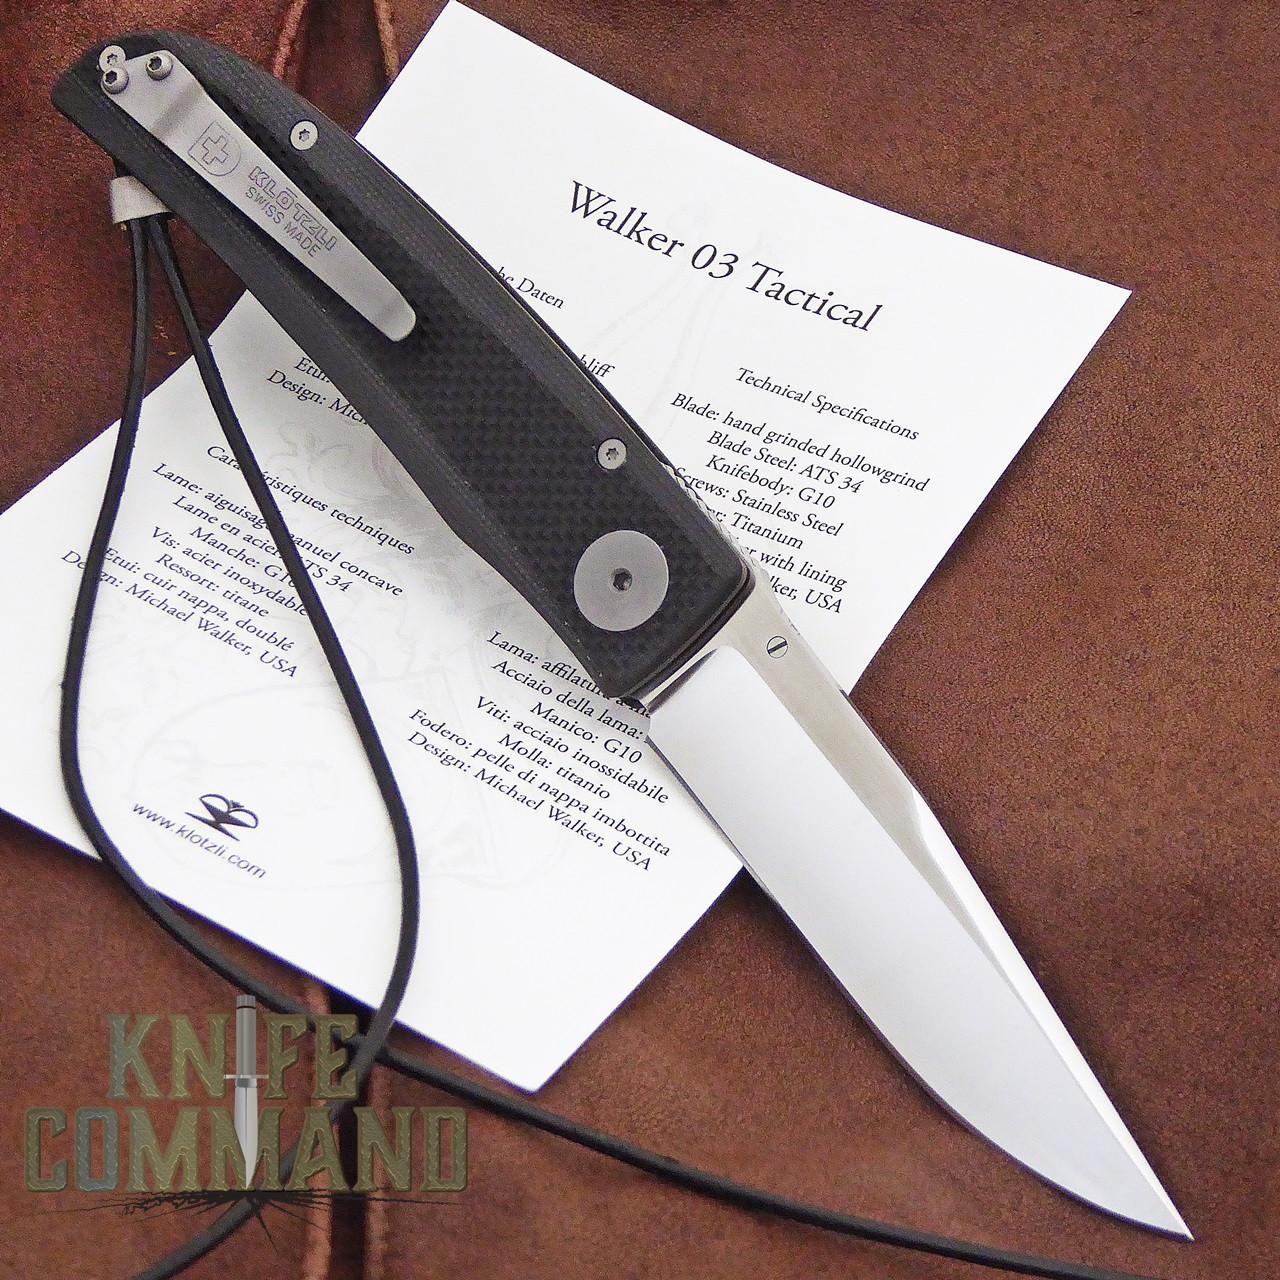 Klotzli Knives Michael Walker 03 Tactical Folding Knife Black WALK-03-TAC-C.  With pocket clip and papers.